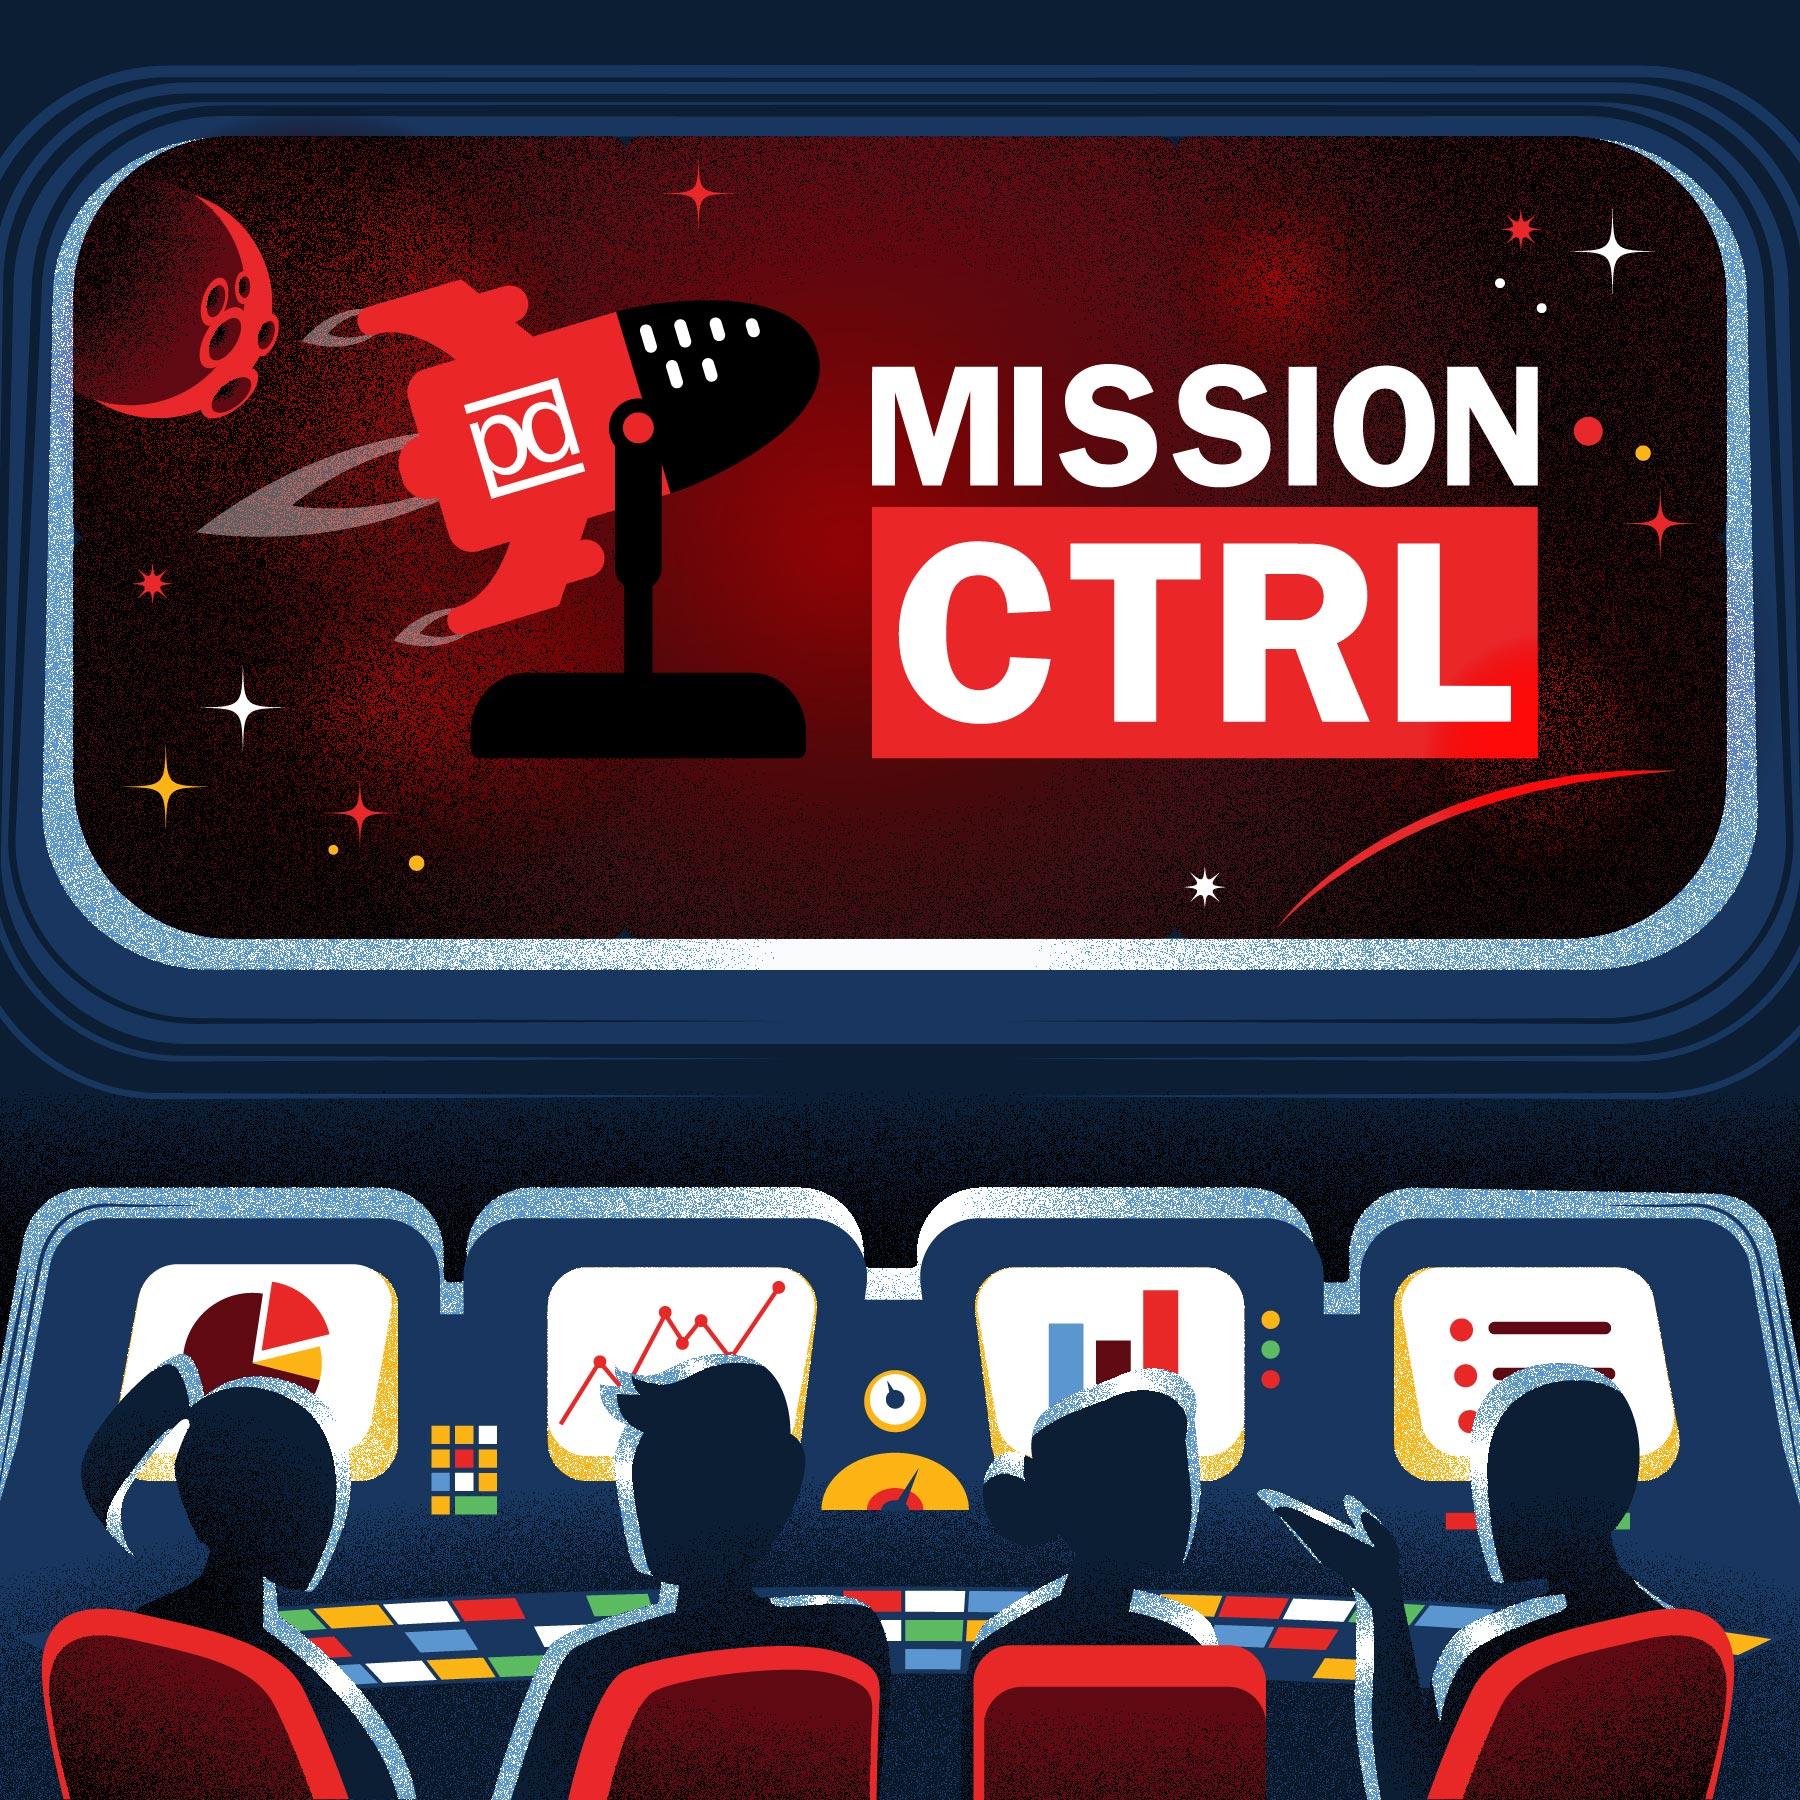 Mission CTRL